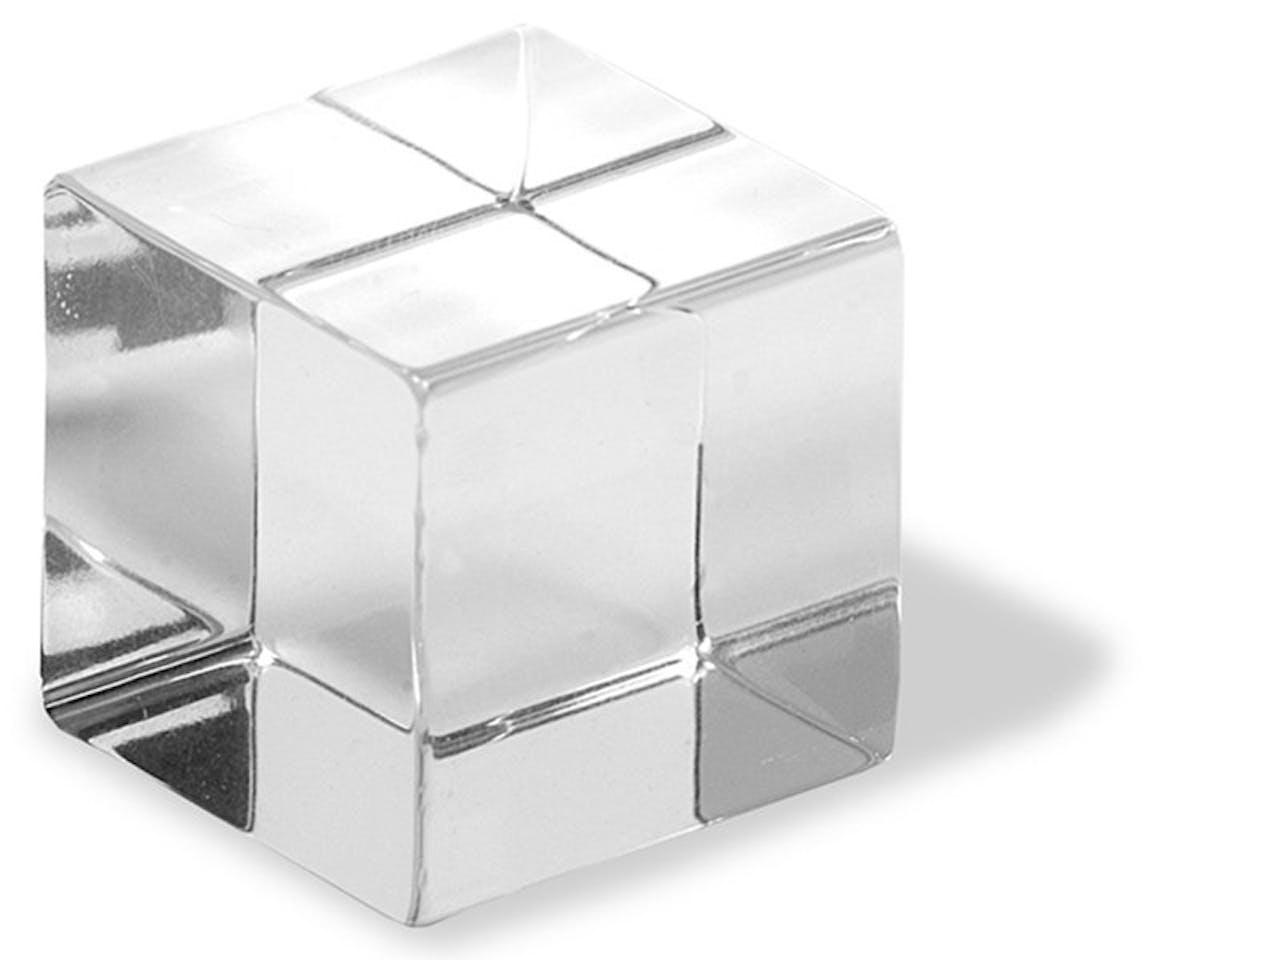 Acrylglas XT Würfel, transparent, b = 30,0 mm